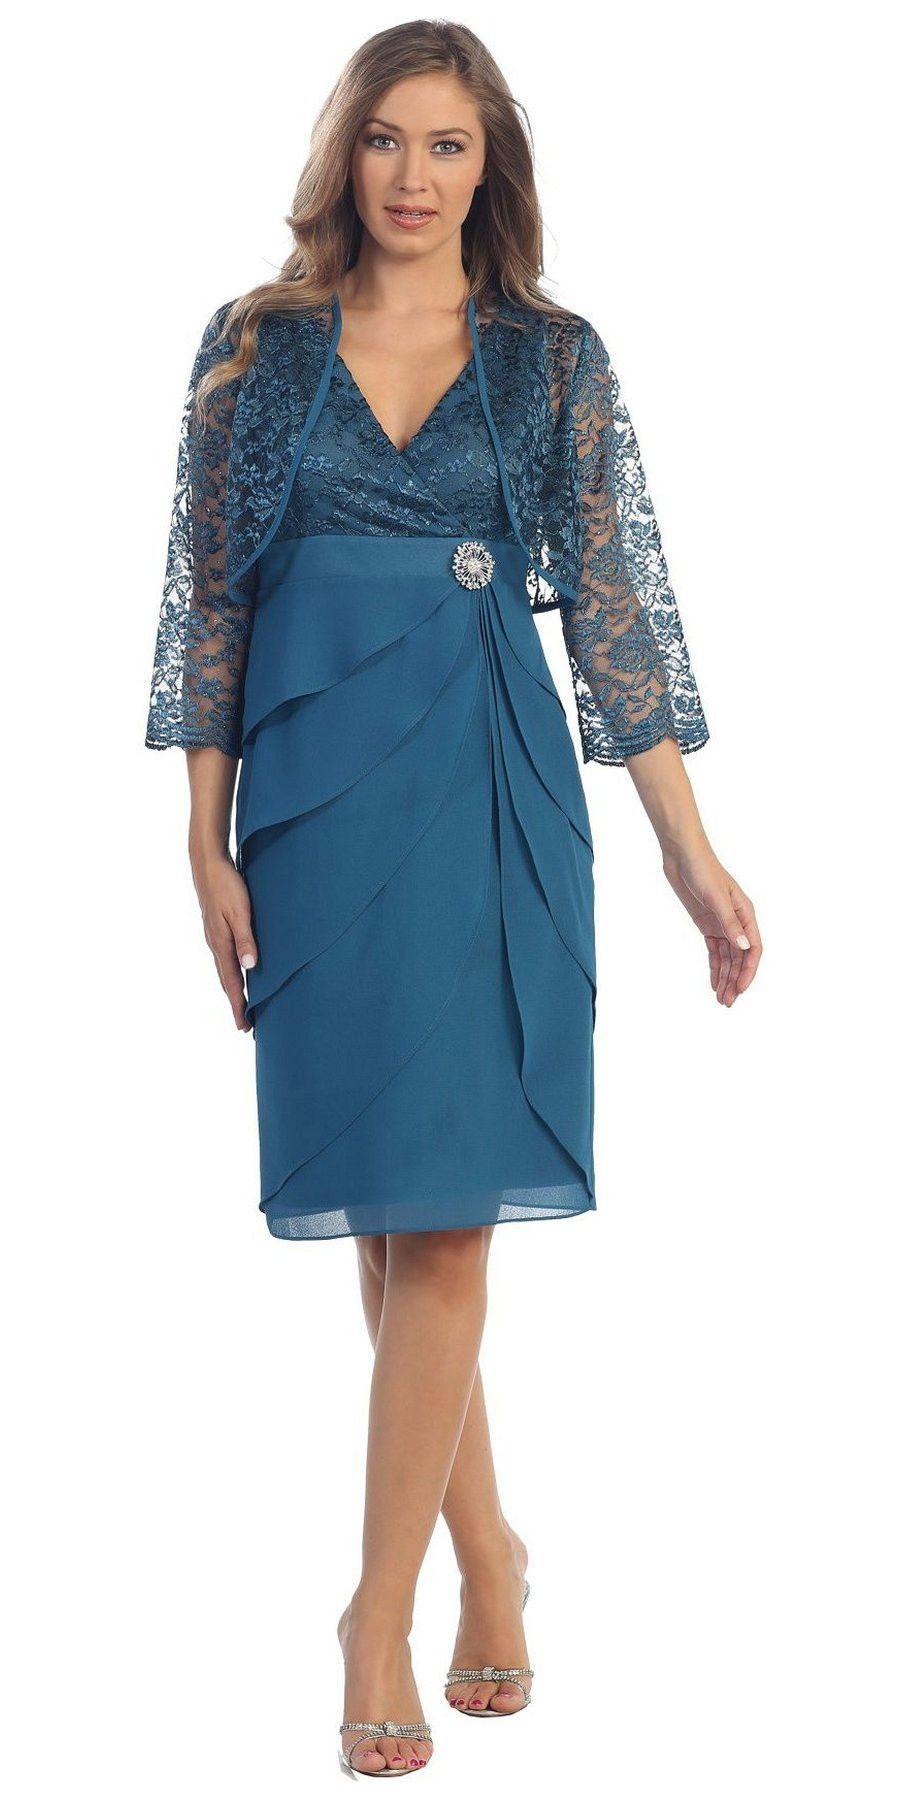 Short Formal Silver Dress V-Neck Lace Chiffon 3/4 Sleeve Jacket ...